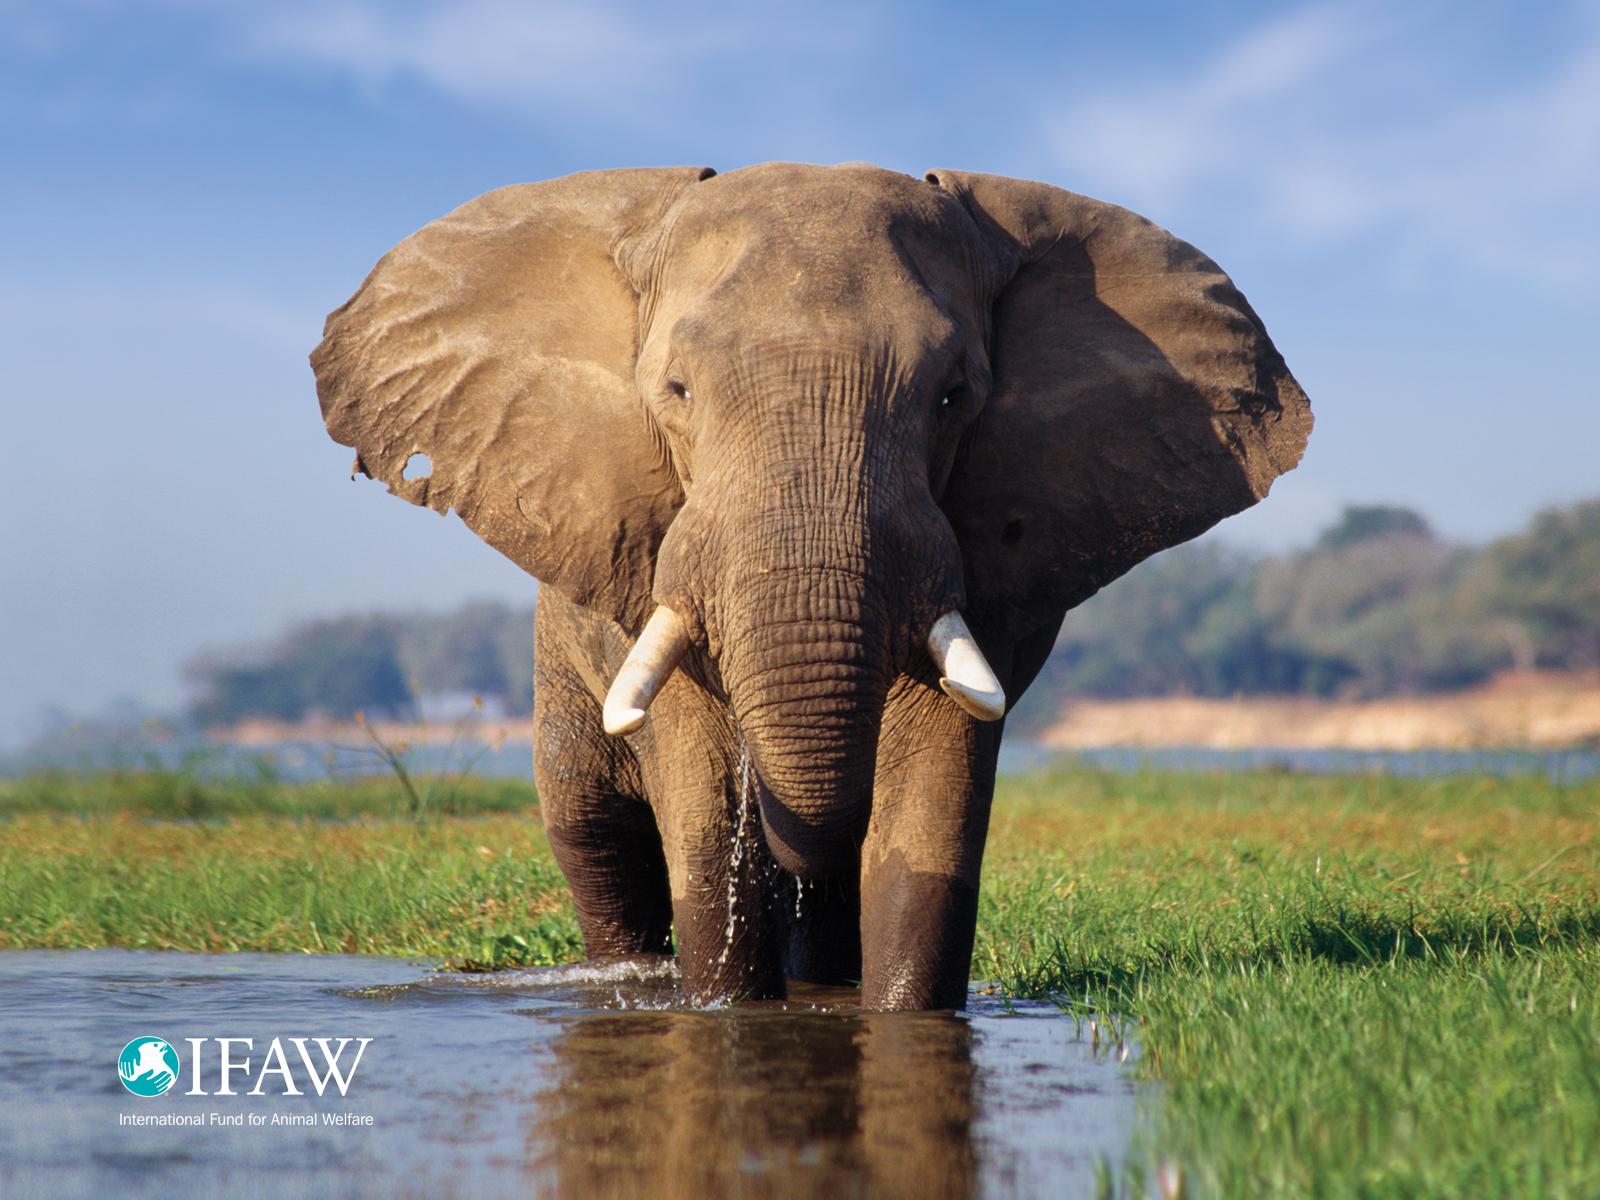 elephant wallpaper ifaw international fund for animal welfare. Black Bedroom Furniture Sets. Home Design Ideas